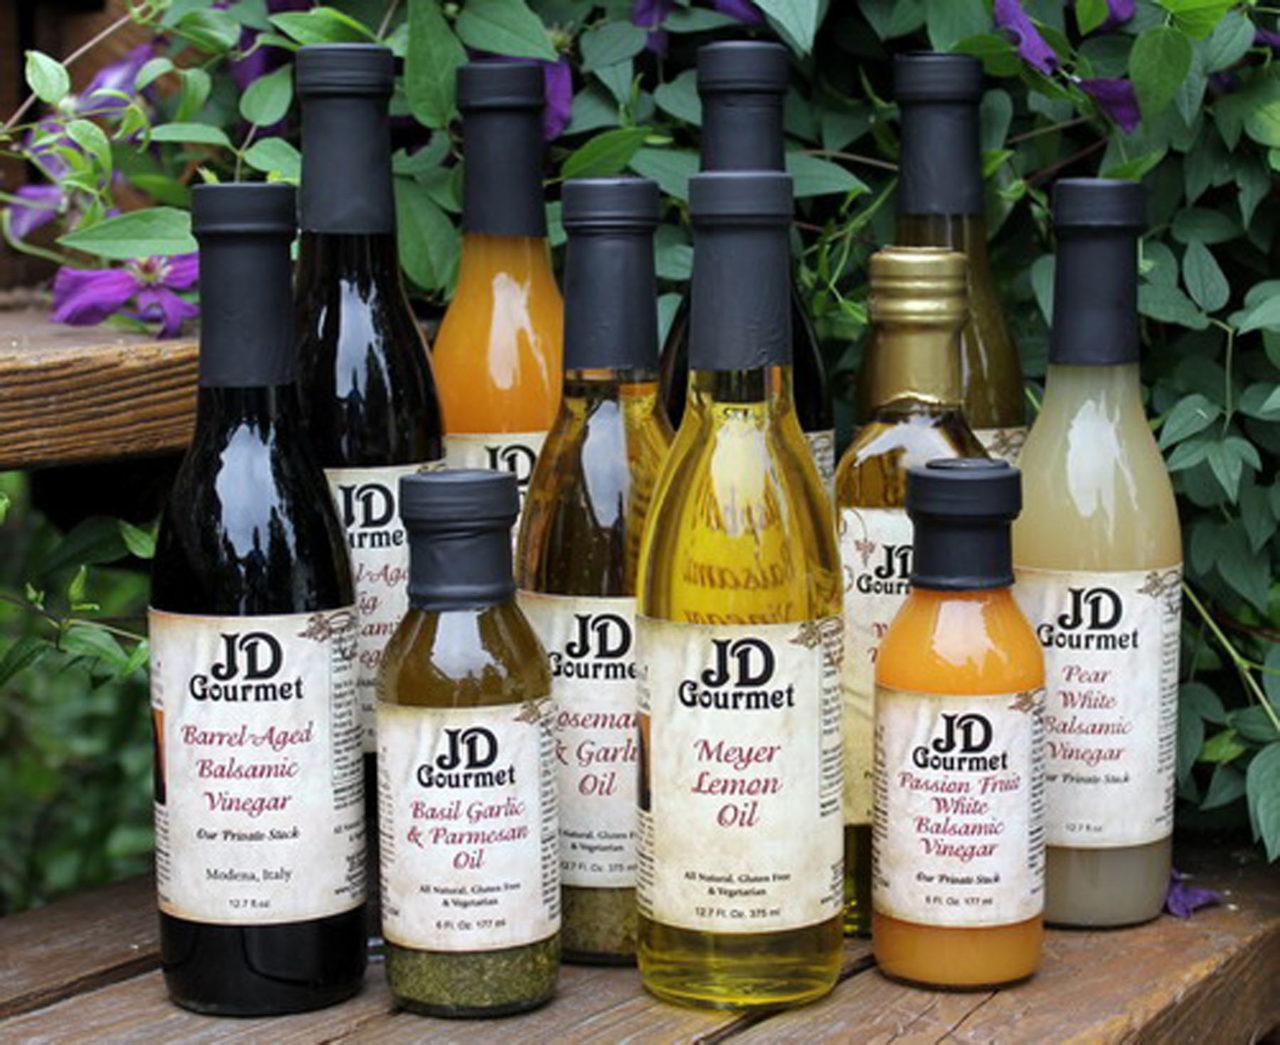 JD-Gourmet-Oils-Vinegars